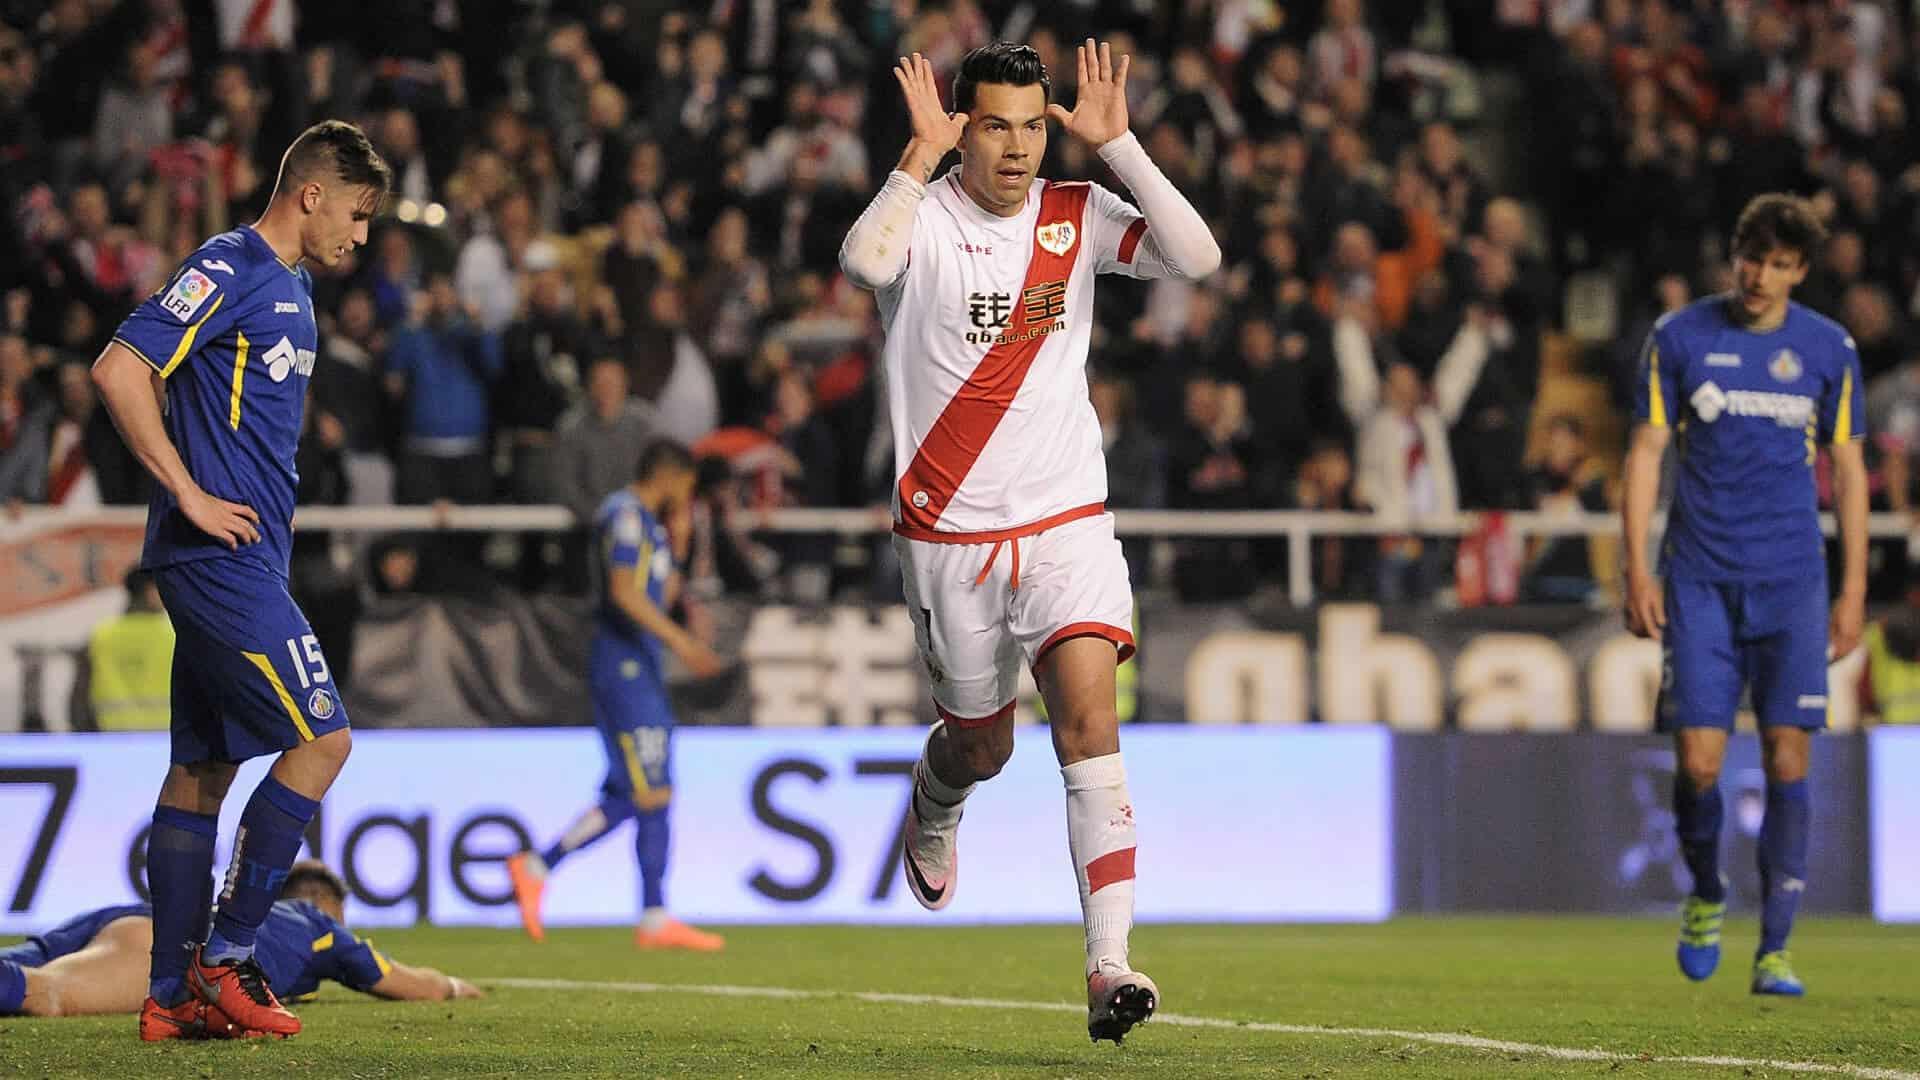 RAYO VALECANO FC SOCCER TEAM 2019